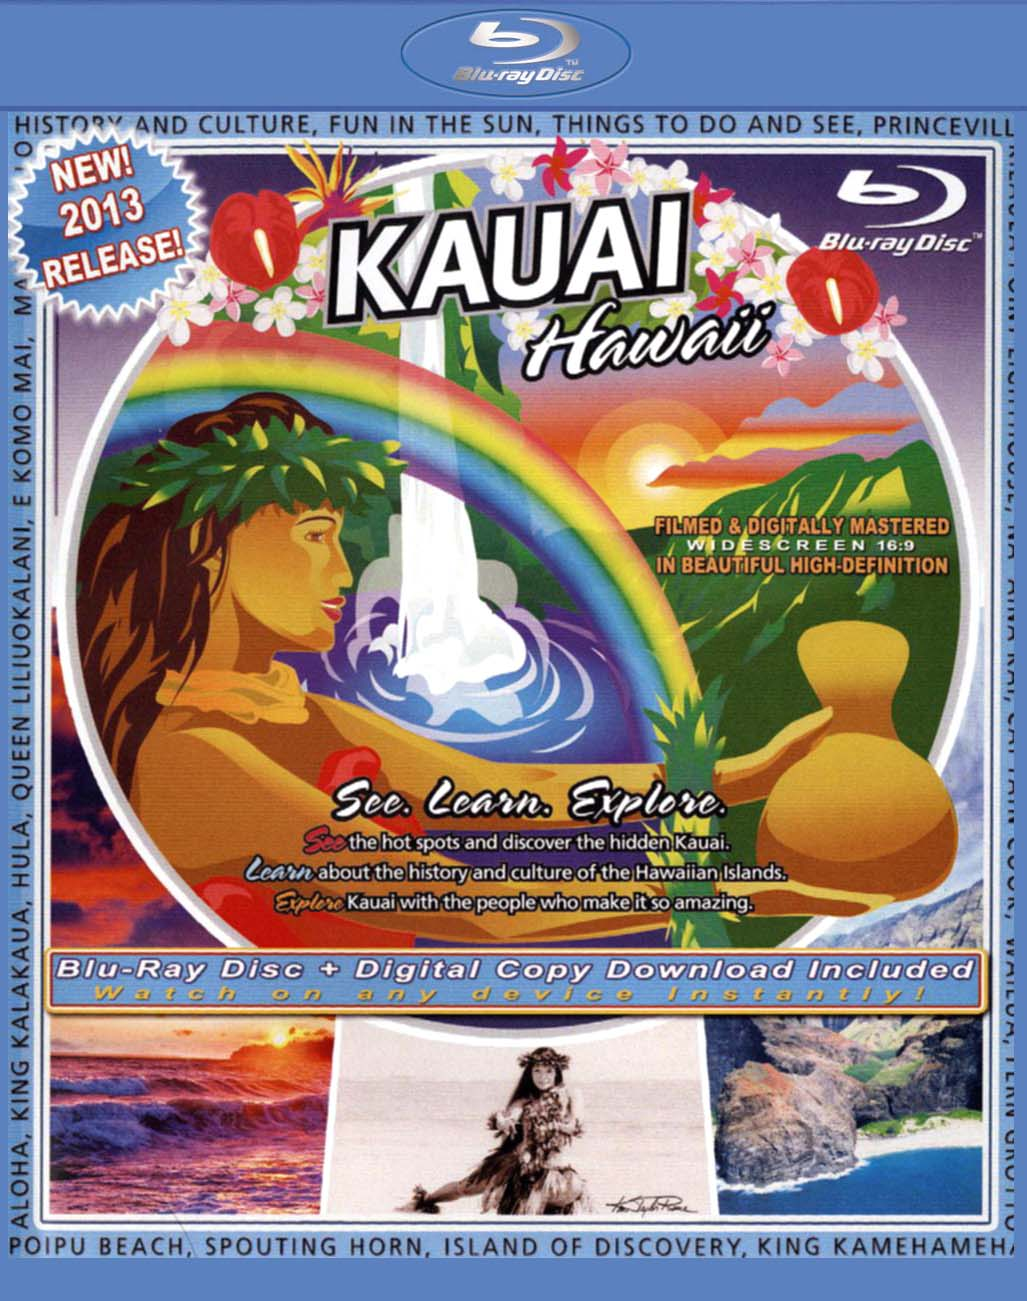 The Video Postcard of Kauai, Hawaii